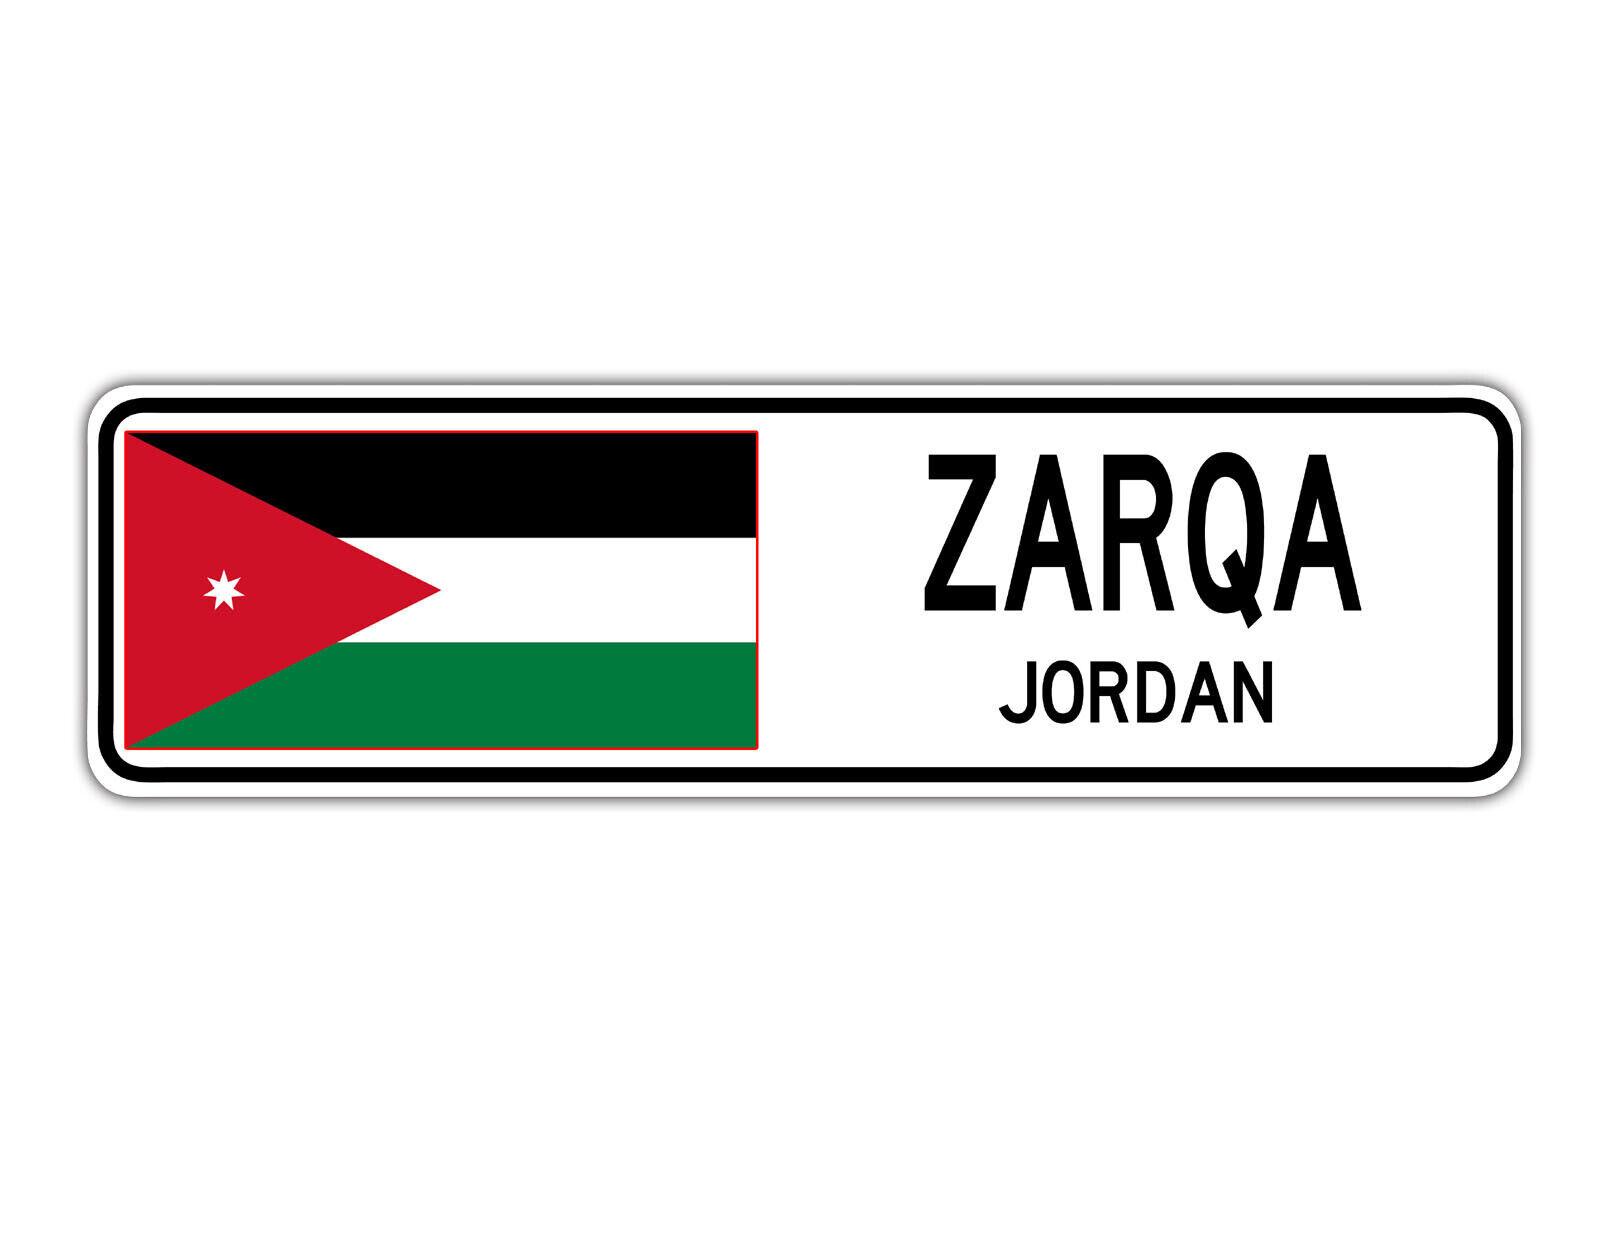 JORDAN Street Sign Jordanian flag city country road wall gift ZARQA